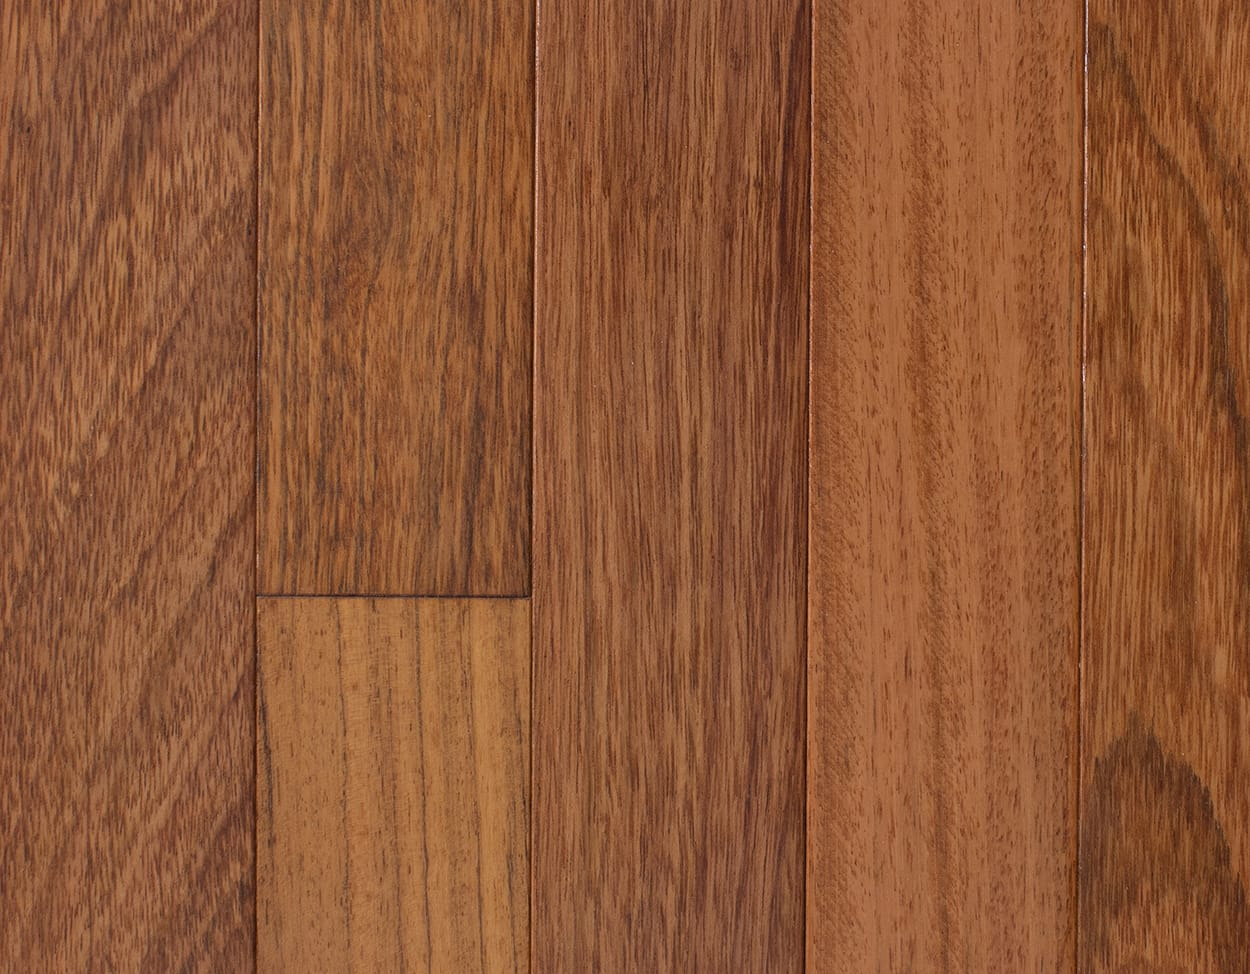 Mullican Meadow Brooke 3 Brazilian Cherry Natural Hardwood Flooring